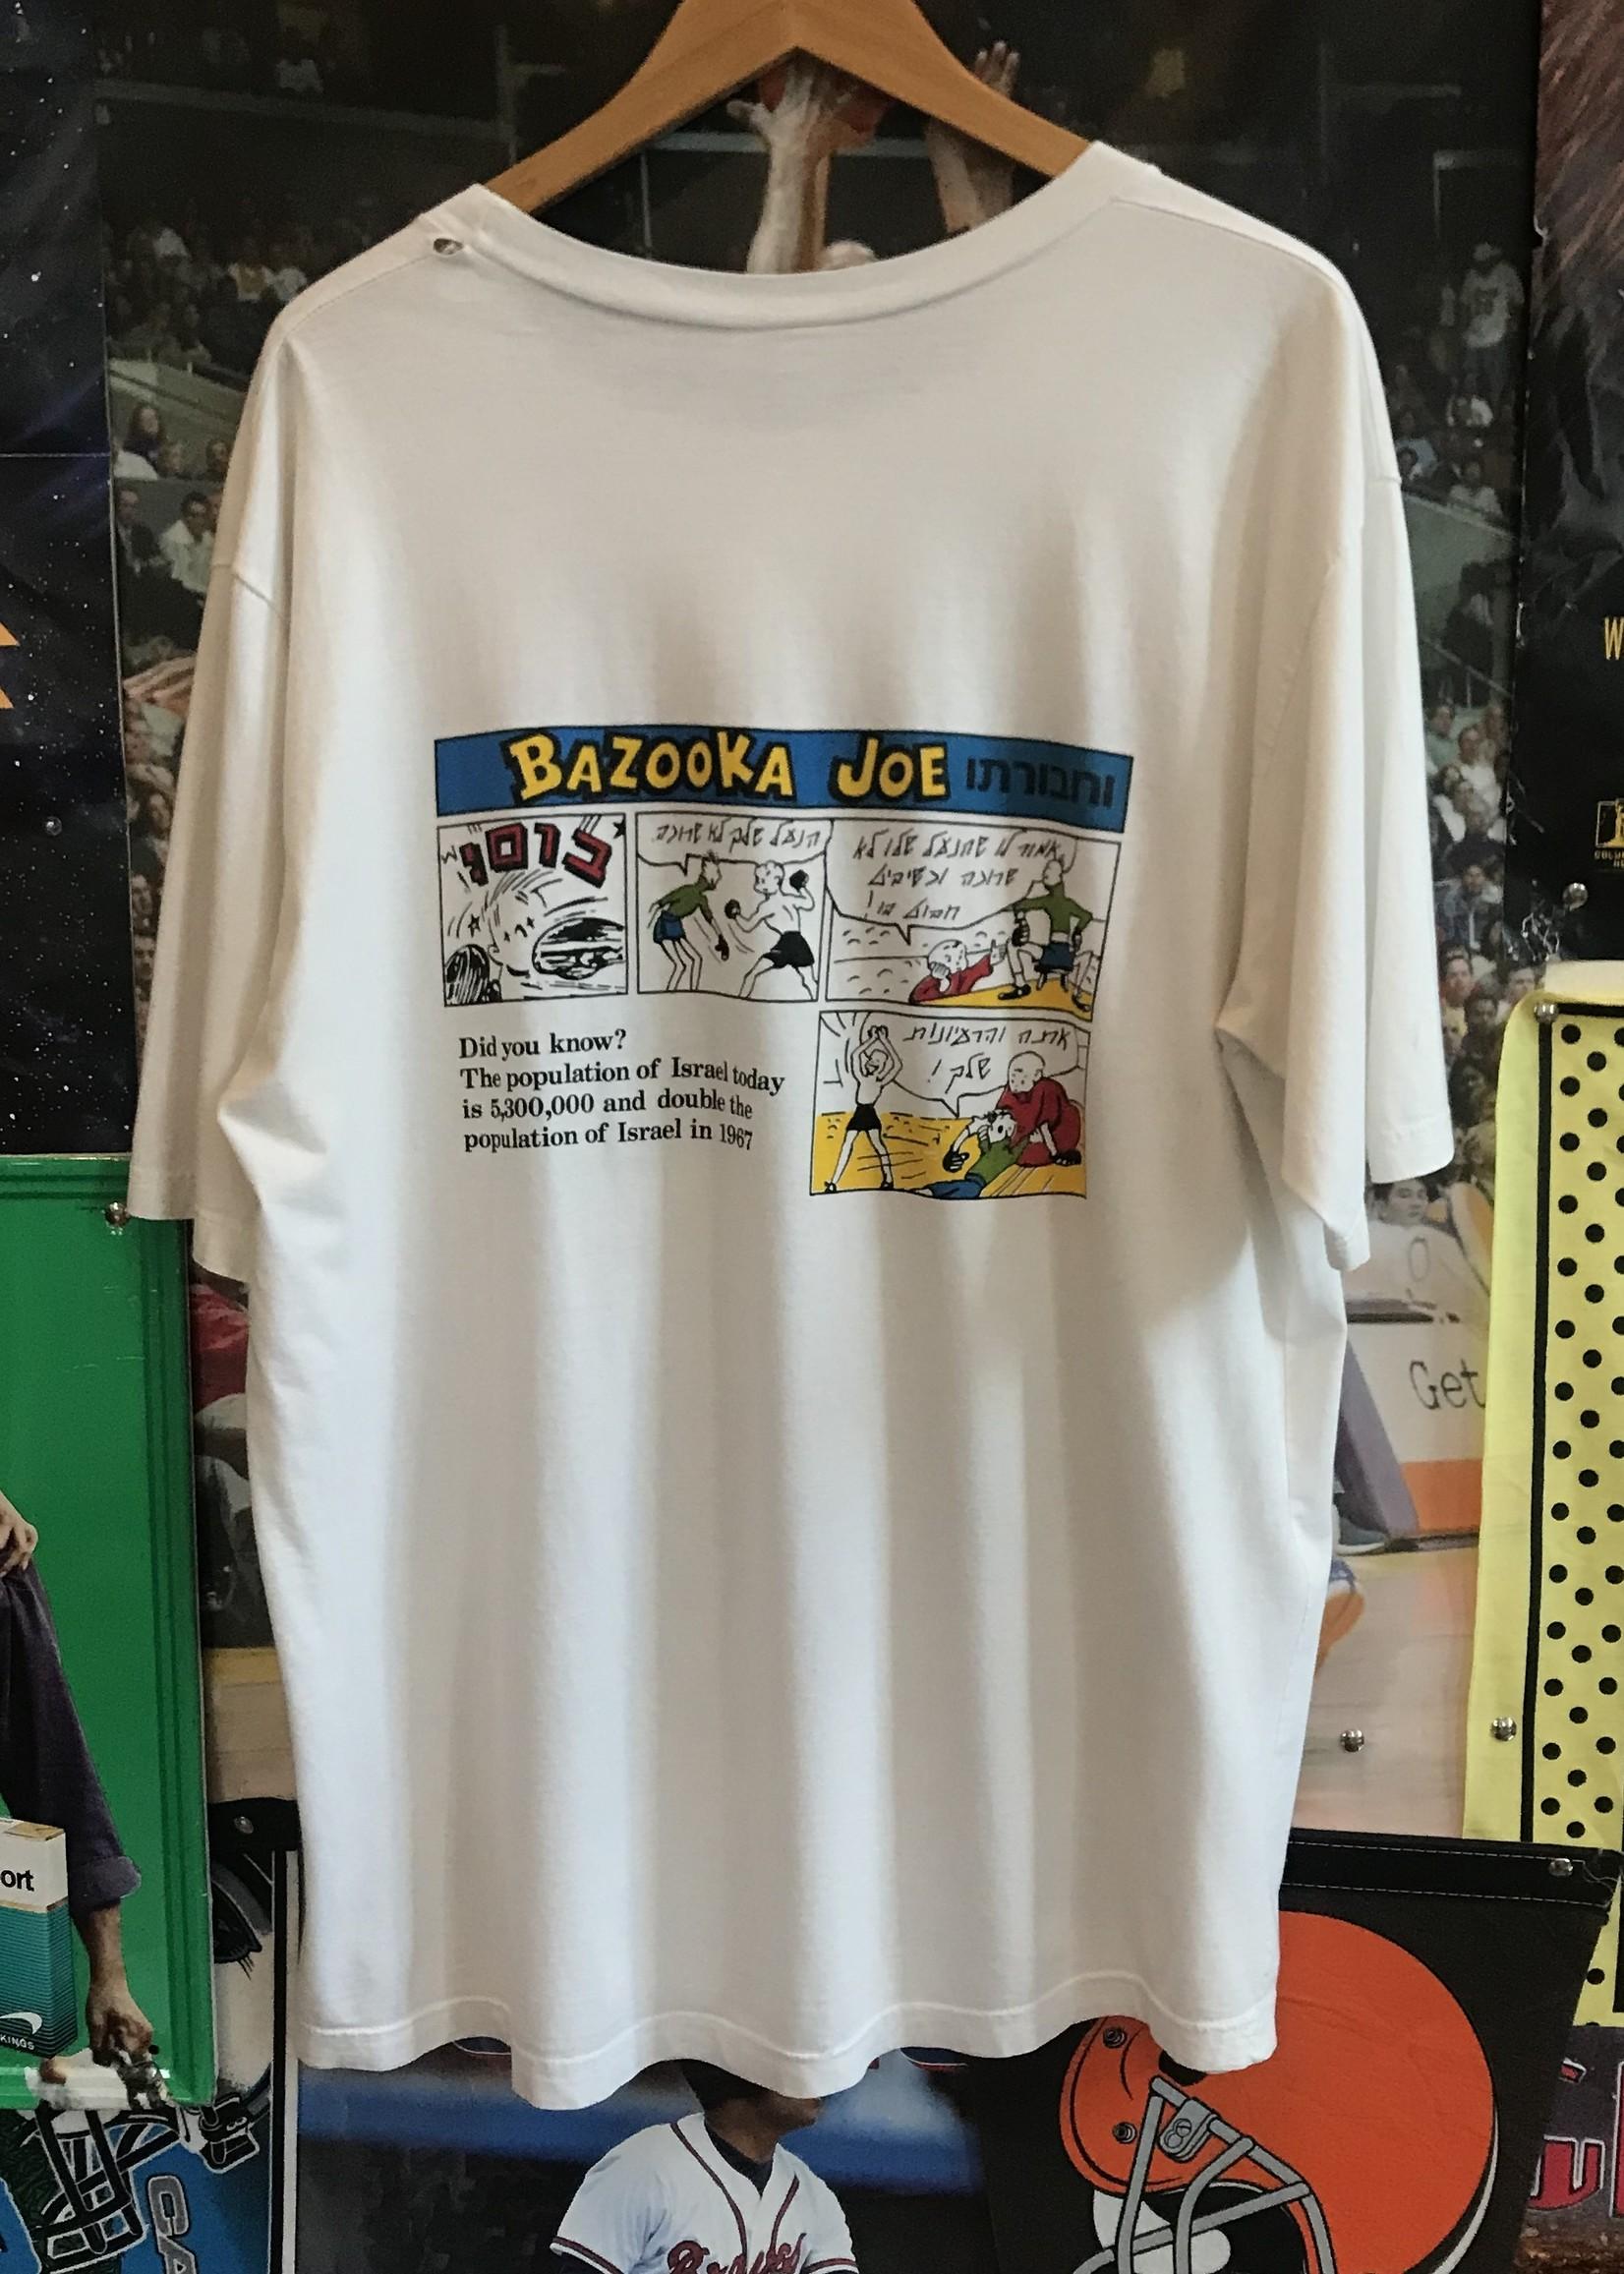 3135bazooka white t shirt sz. XL